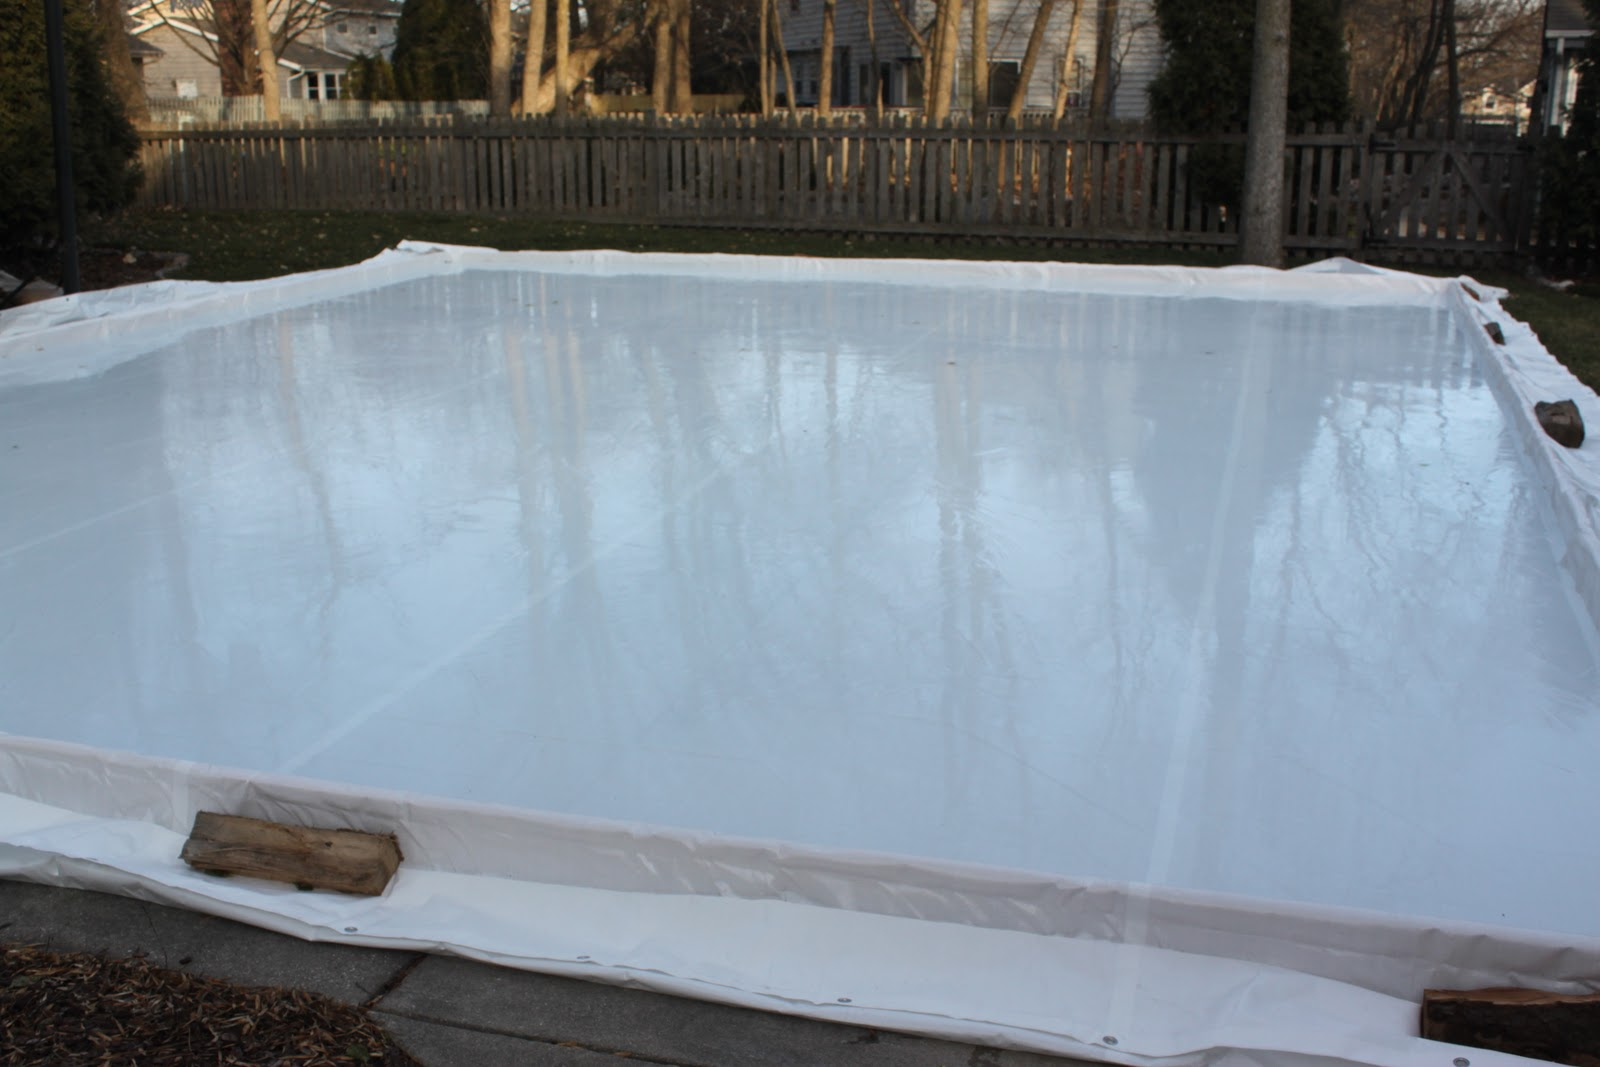 My Best Friend Craig Diy Building An Ice Skating Rink